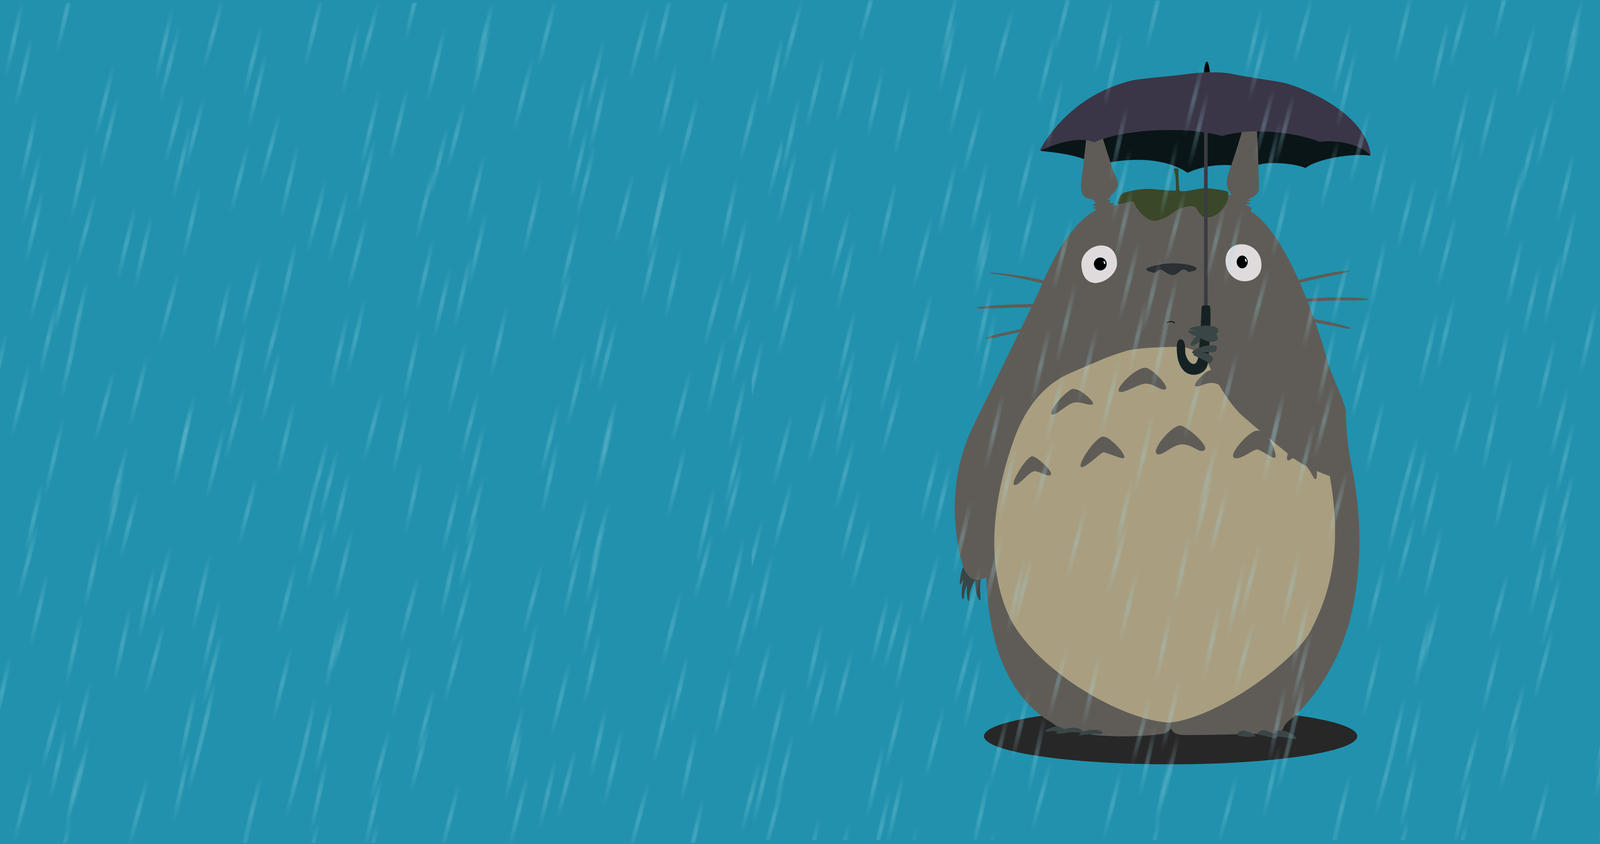 My Neighbor Totoro Wallpaper By Plplpl5 On Deviantart